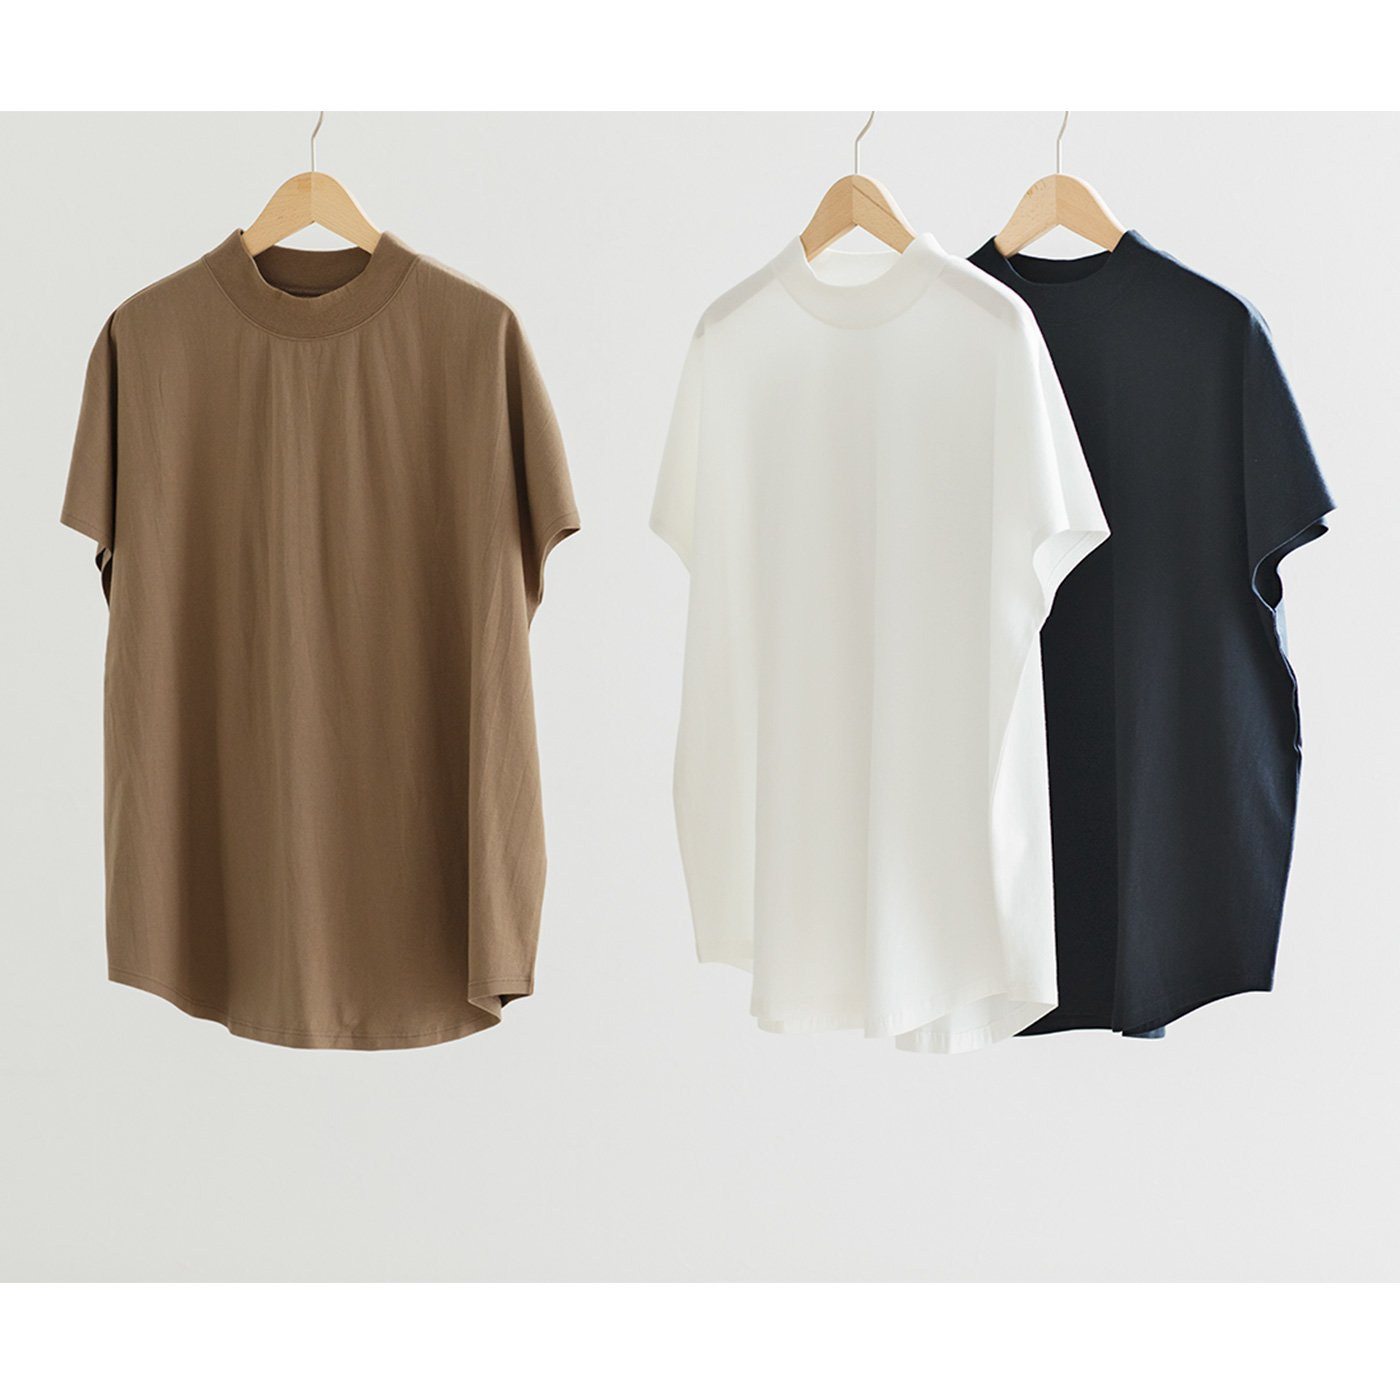 THREE FIFTY STANDARD フレンチスリーブデザインTシャツの会